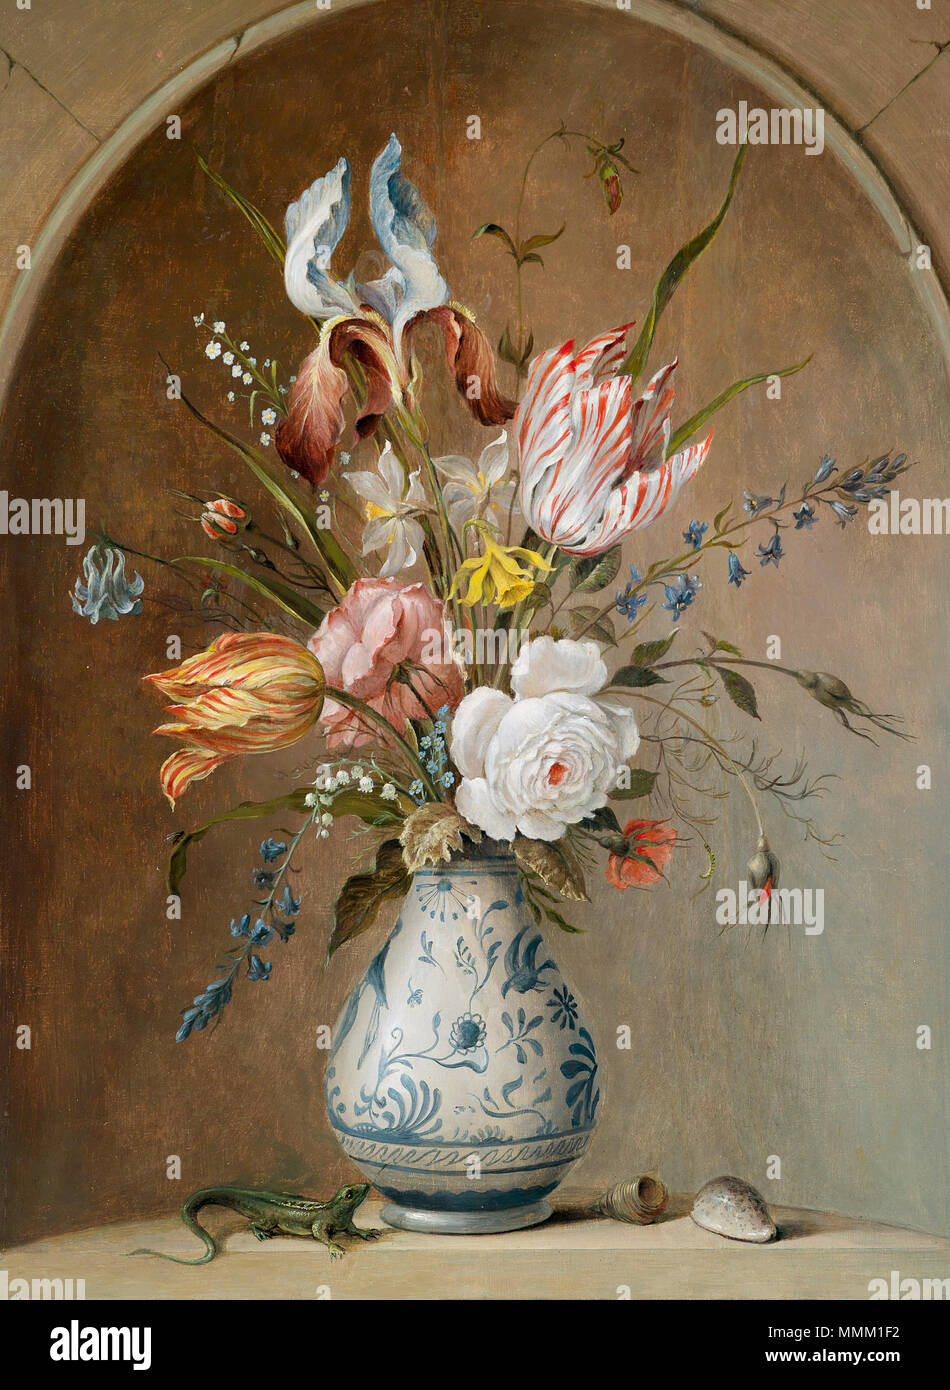 . Blumenstillleben, Öl auf Holz, 63 x 48 cm . 17e siècle. Anonyme, cercle de Balthasar van der Ast (ch. 1594-1657) et Johannes Baers Flower still life (cercle de van der Ast - Baers) Banque D'Images